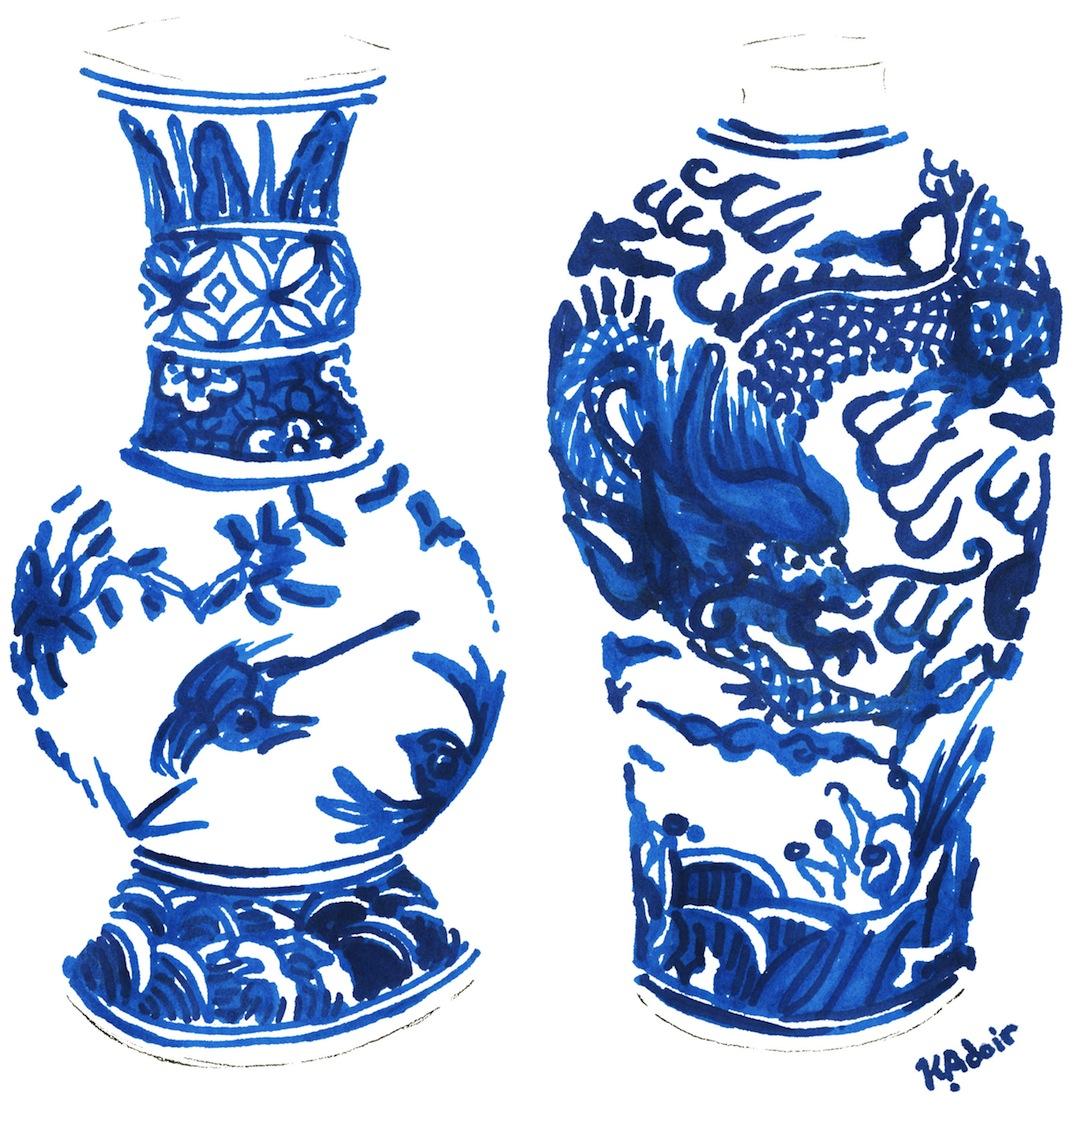 KFaji_blue&white_vases.jpg